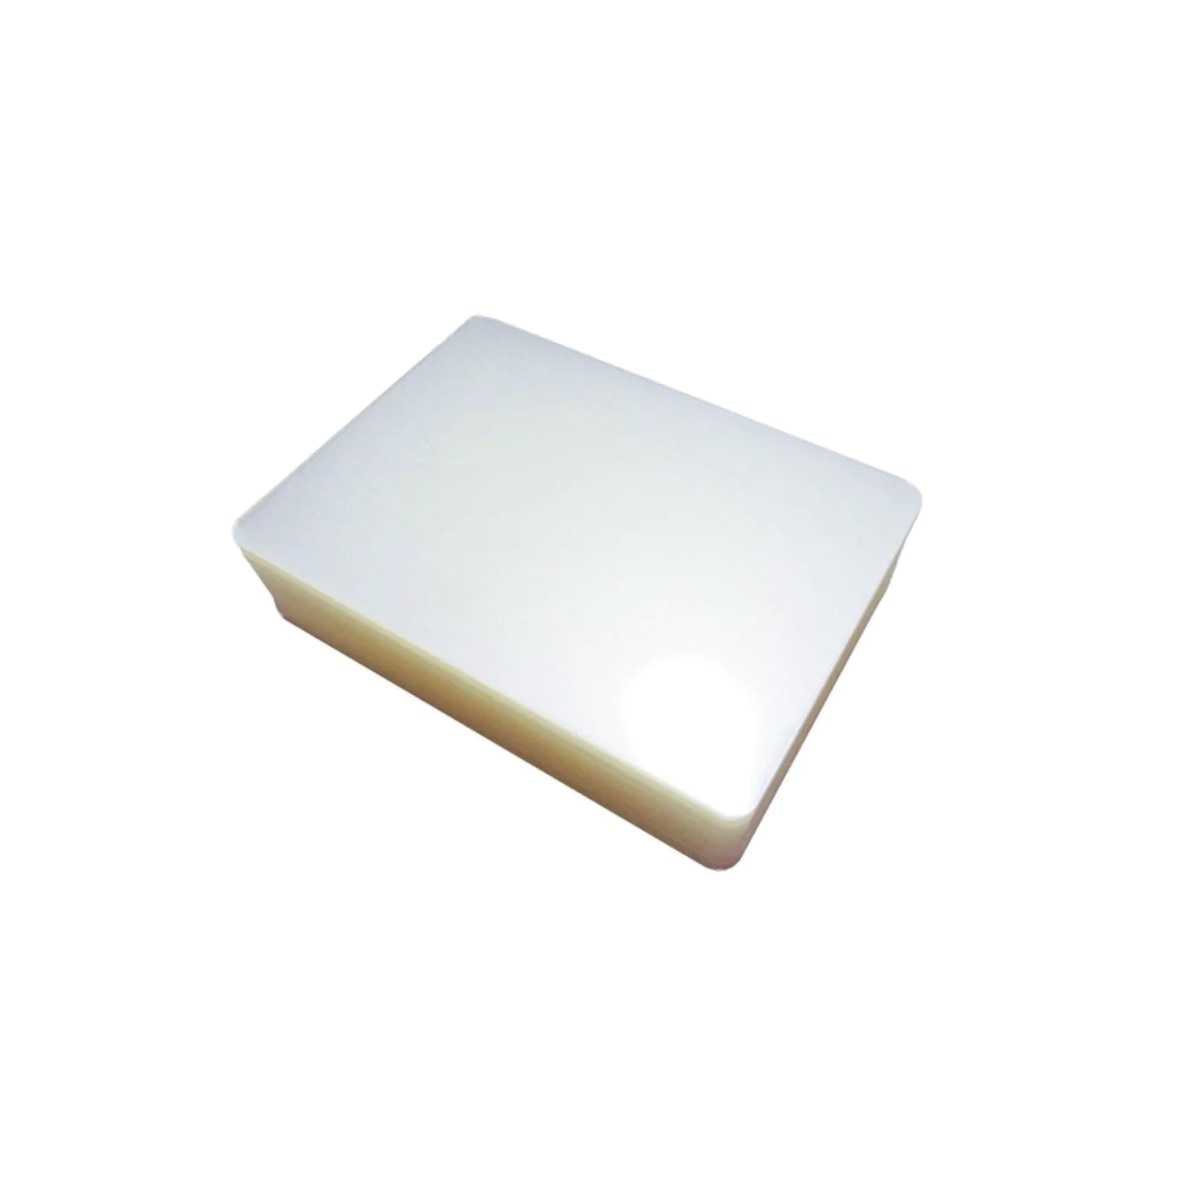 Polaseal plástico para plastificação CPF 66X99 0,07mm 100un